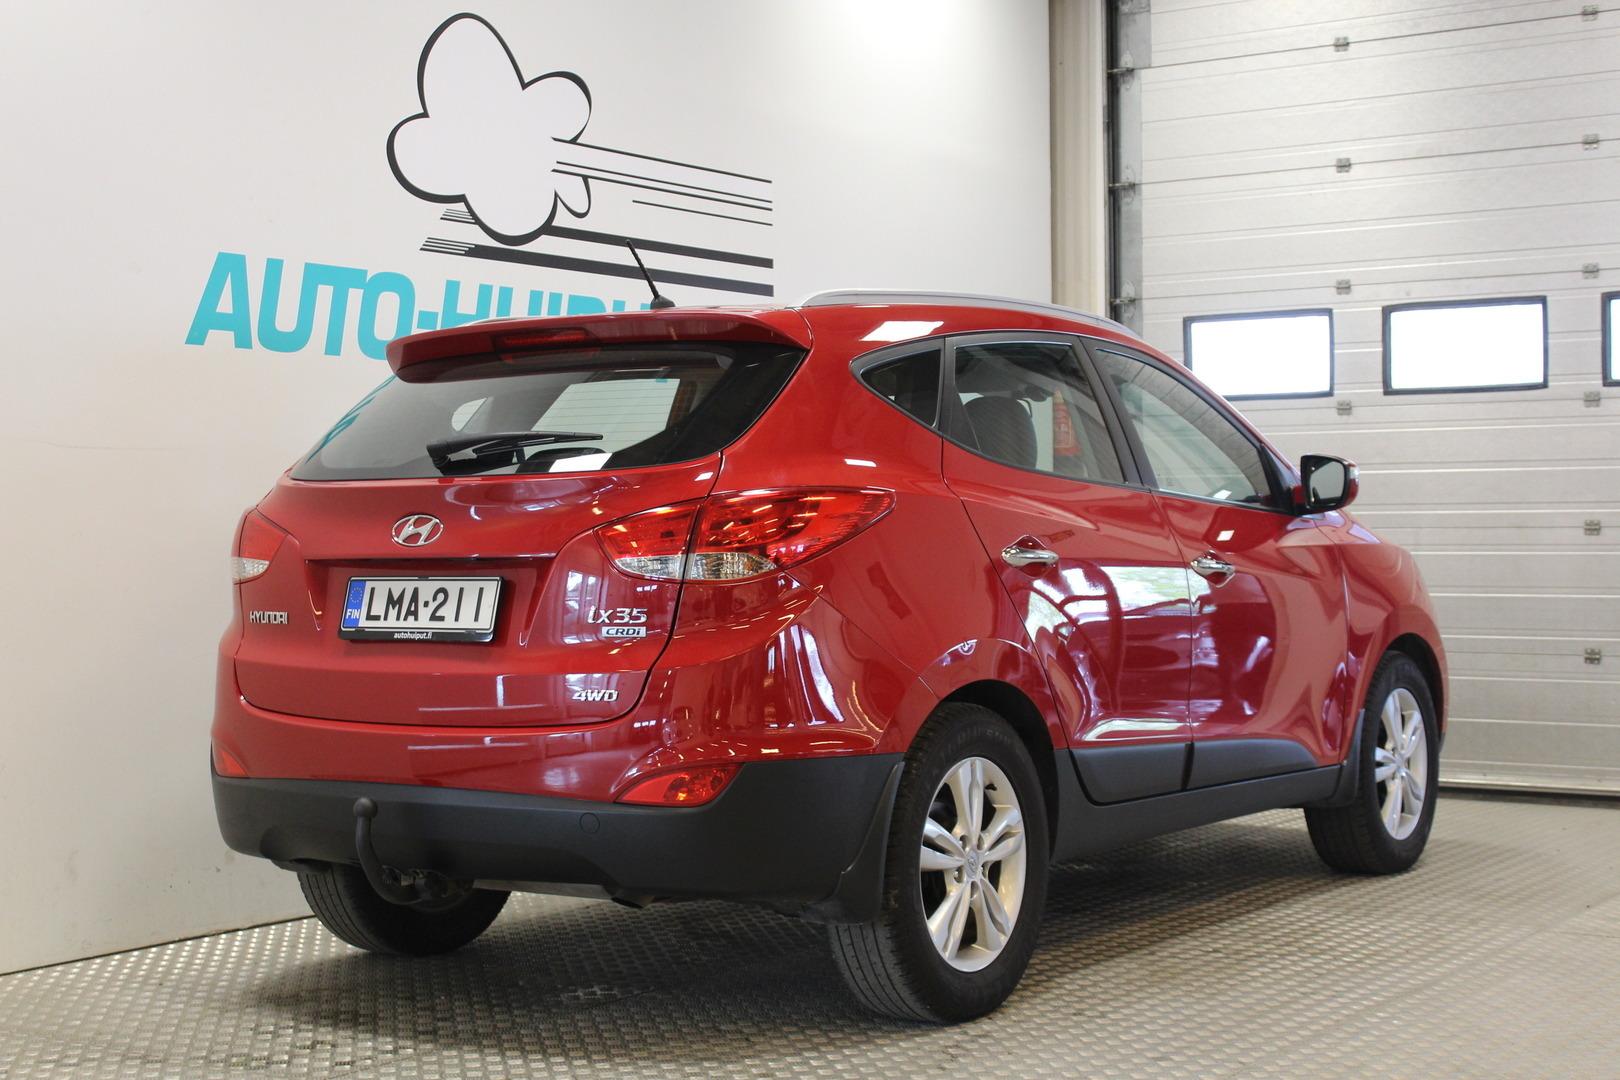 Hyundai ix35, 2,0 CRDI-R 135kW 4wd #2-Omisteinen #Automaatti #Neliveto